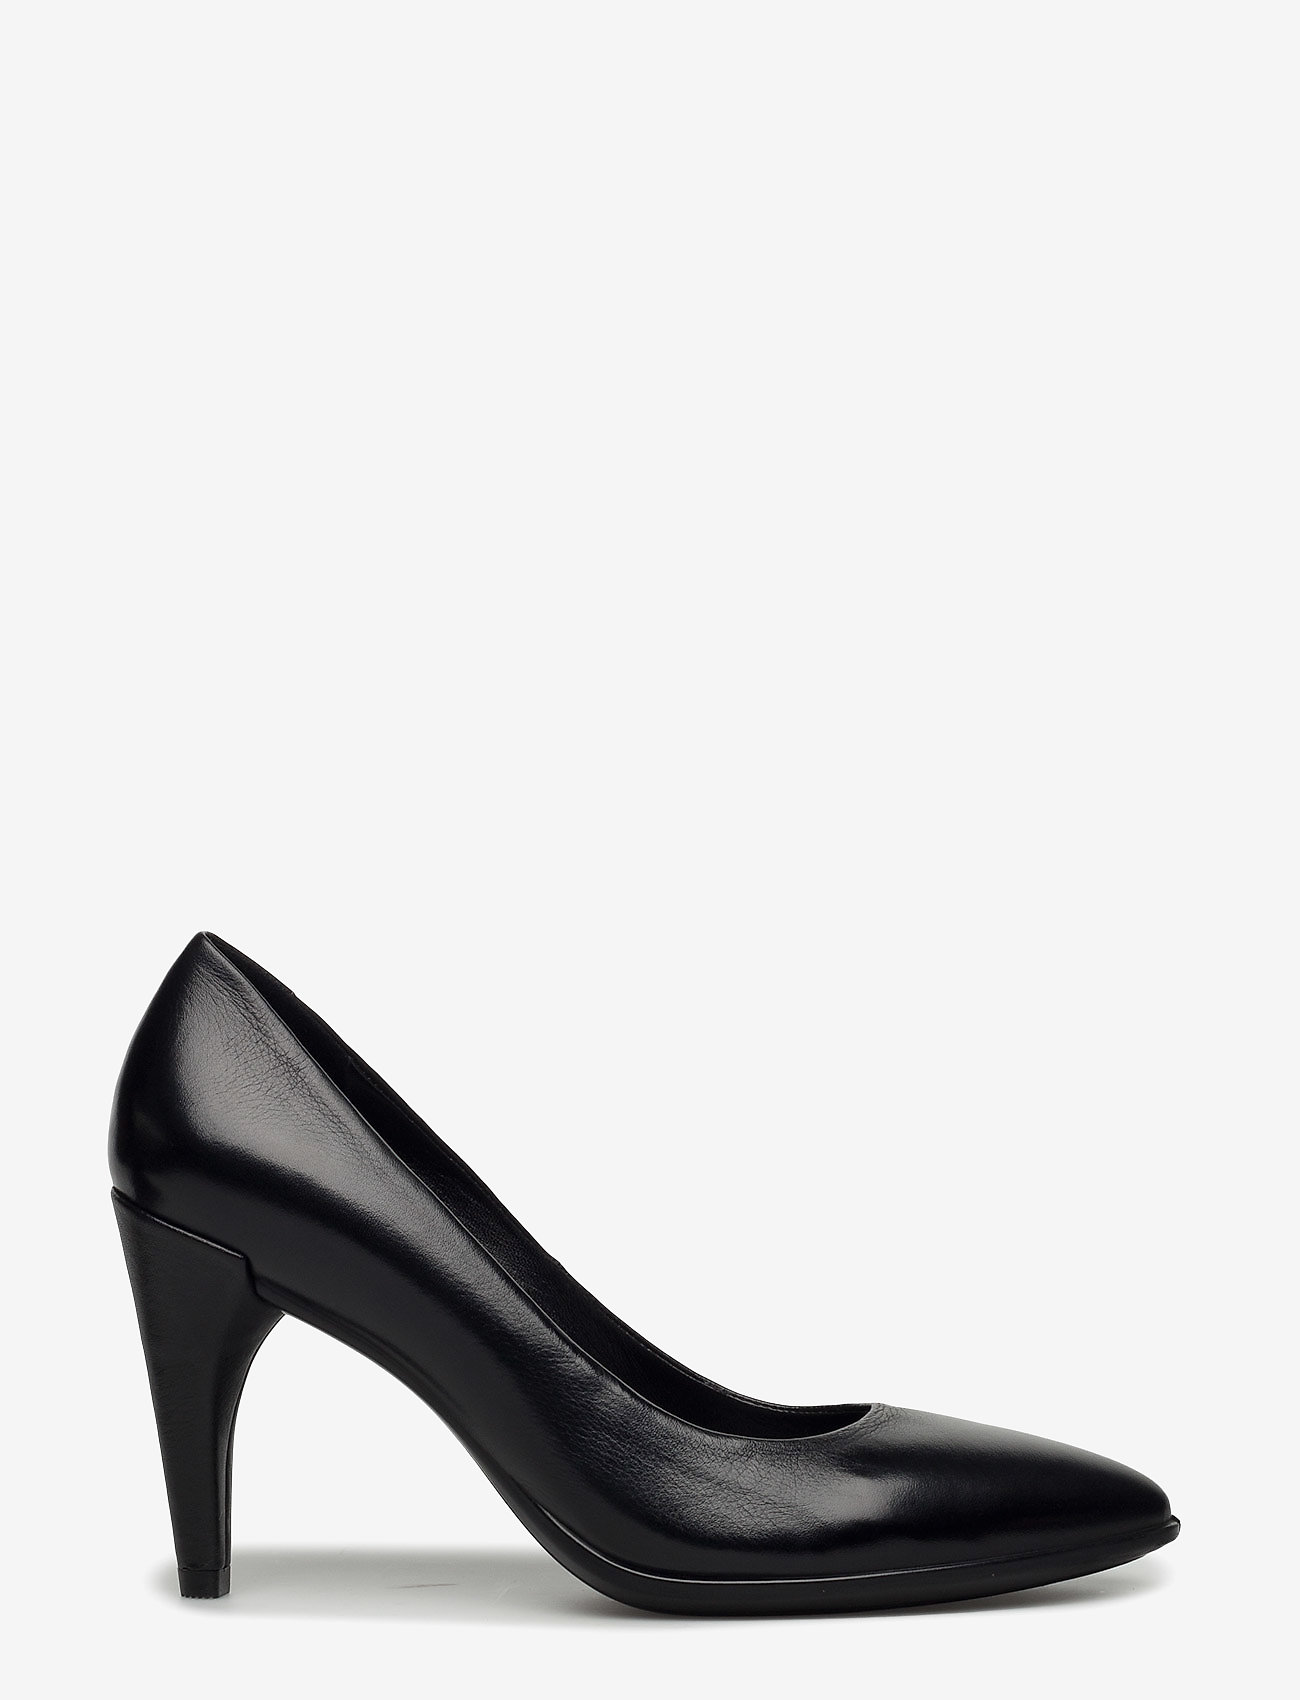 ECCO - SHAPE 75 POINTY - klasiski augstpapēžu apavi - black - 1